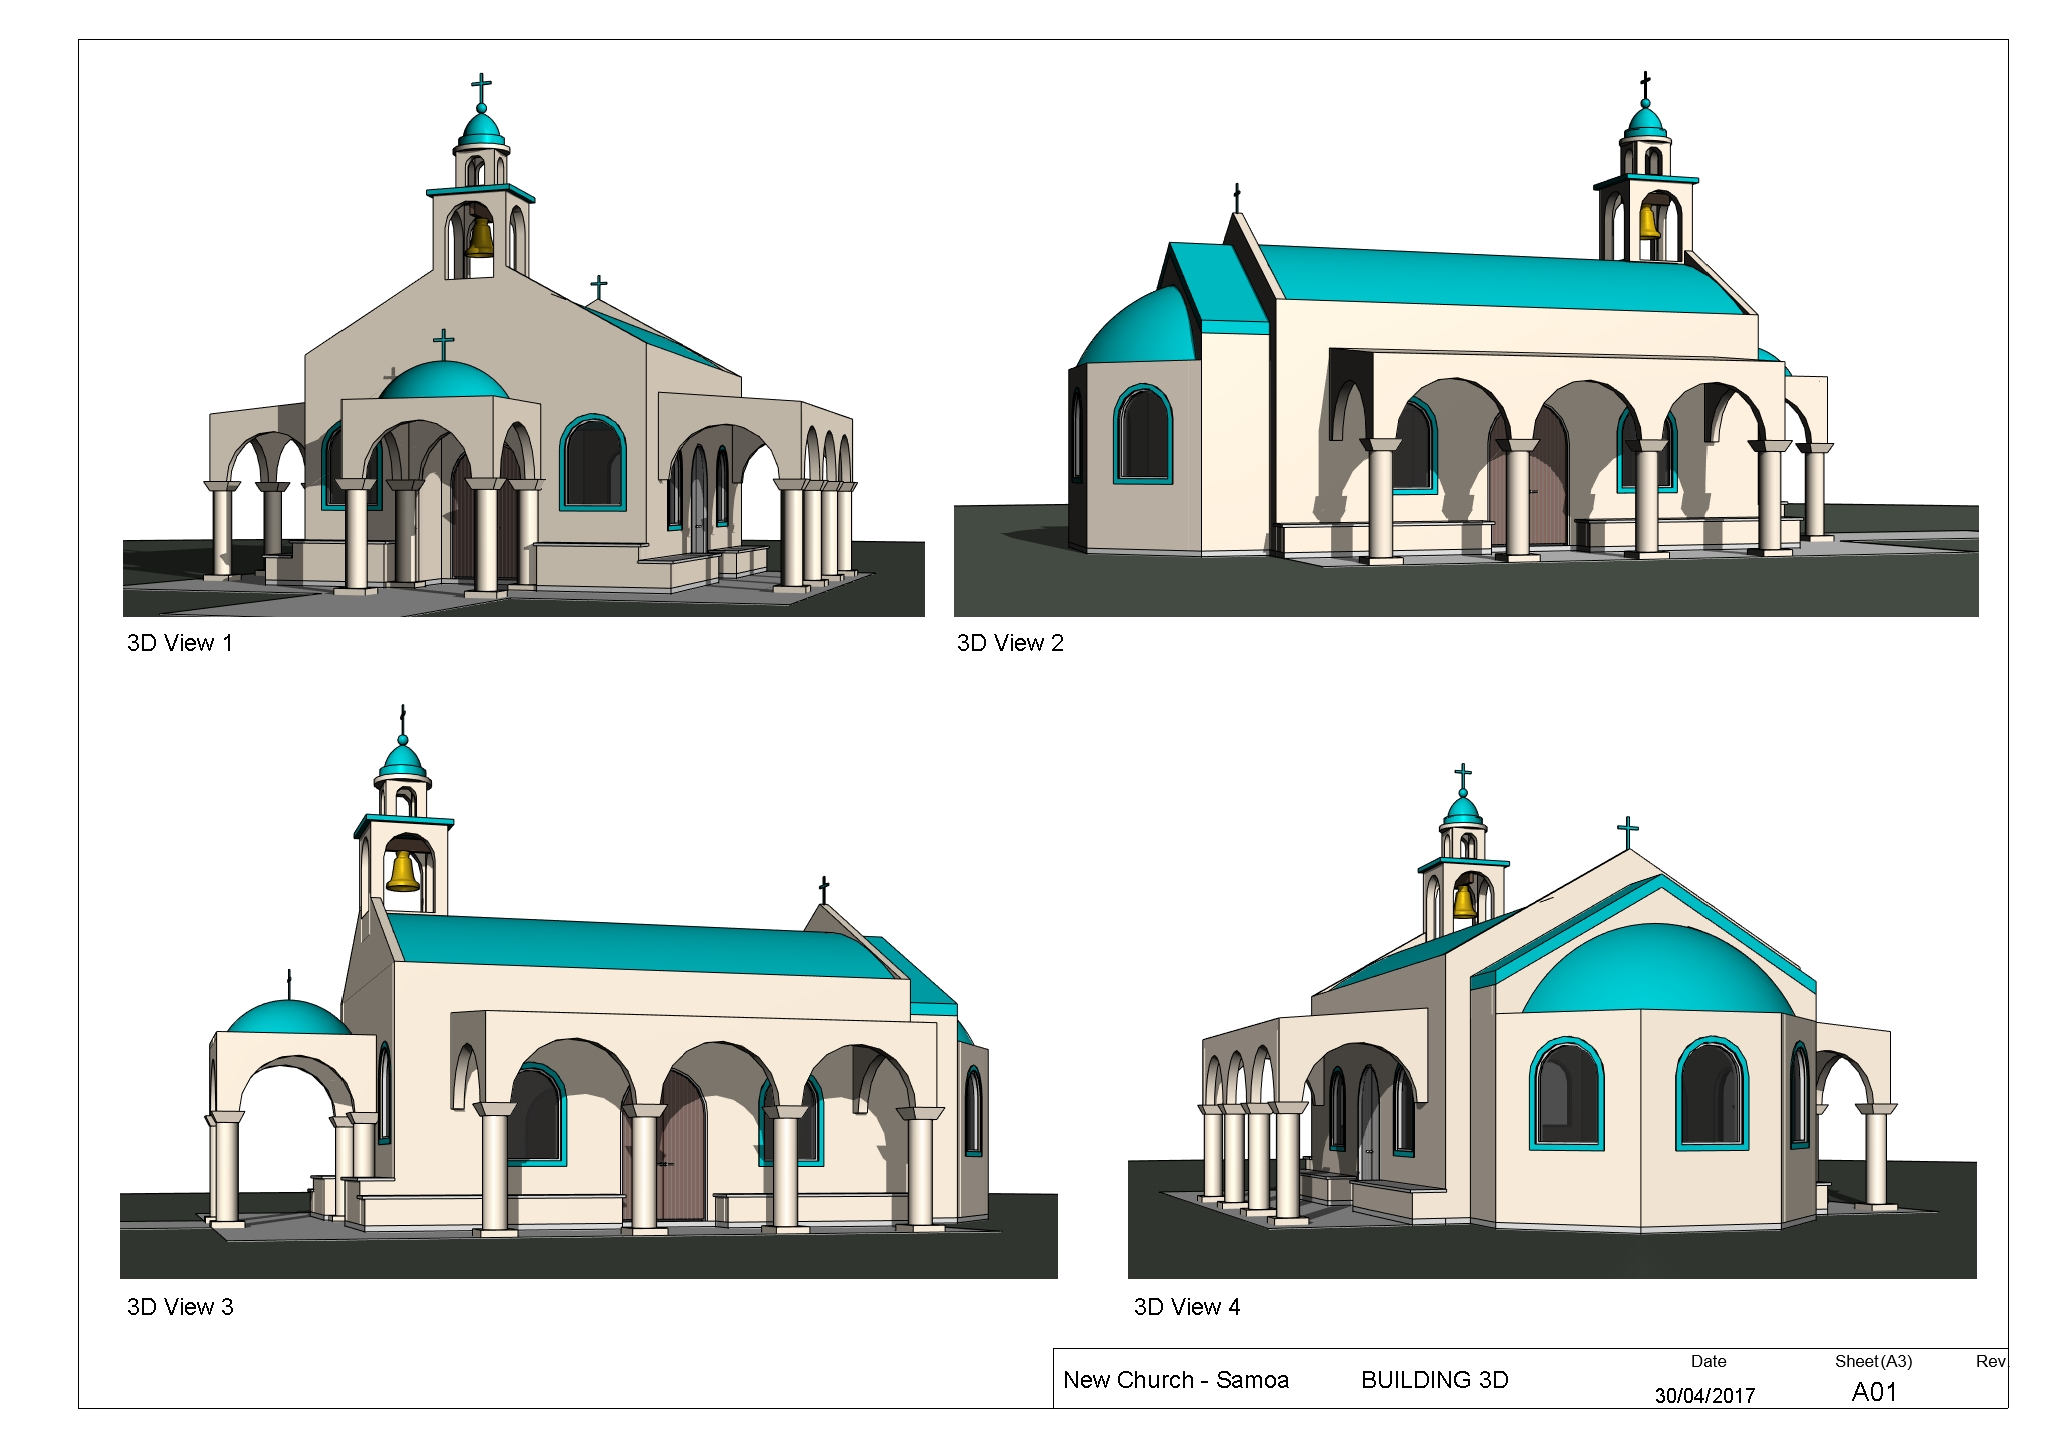 St JohnCurch Samoa